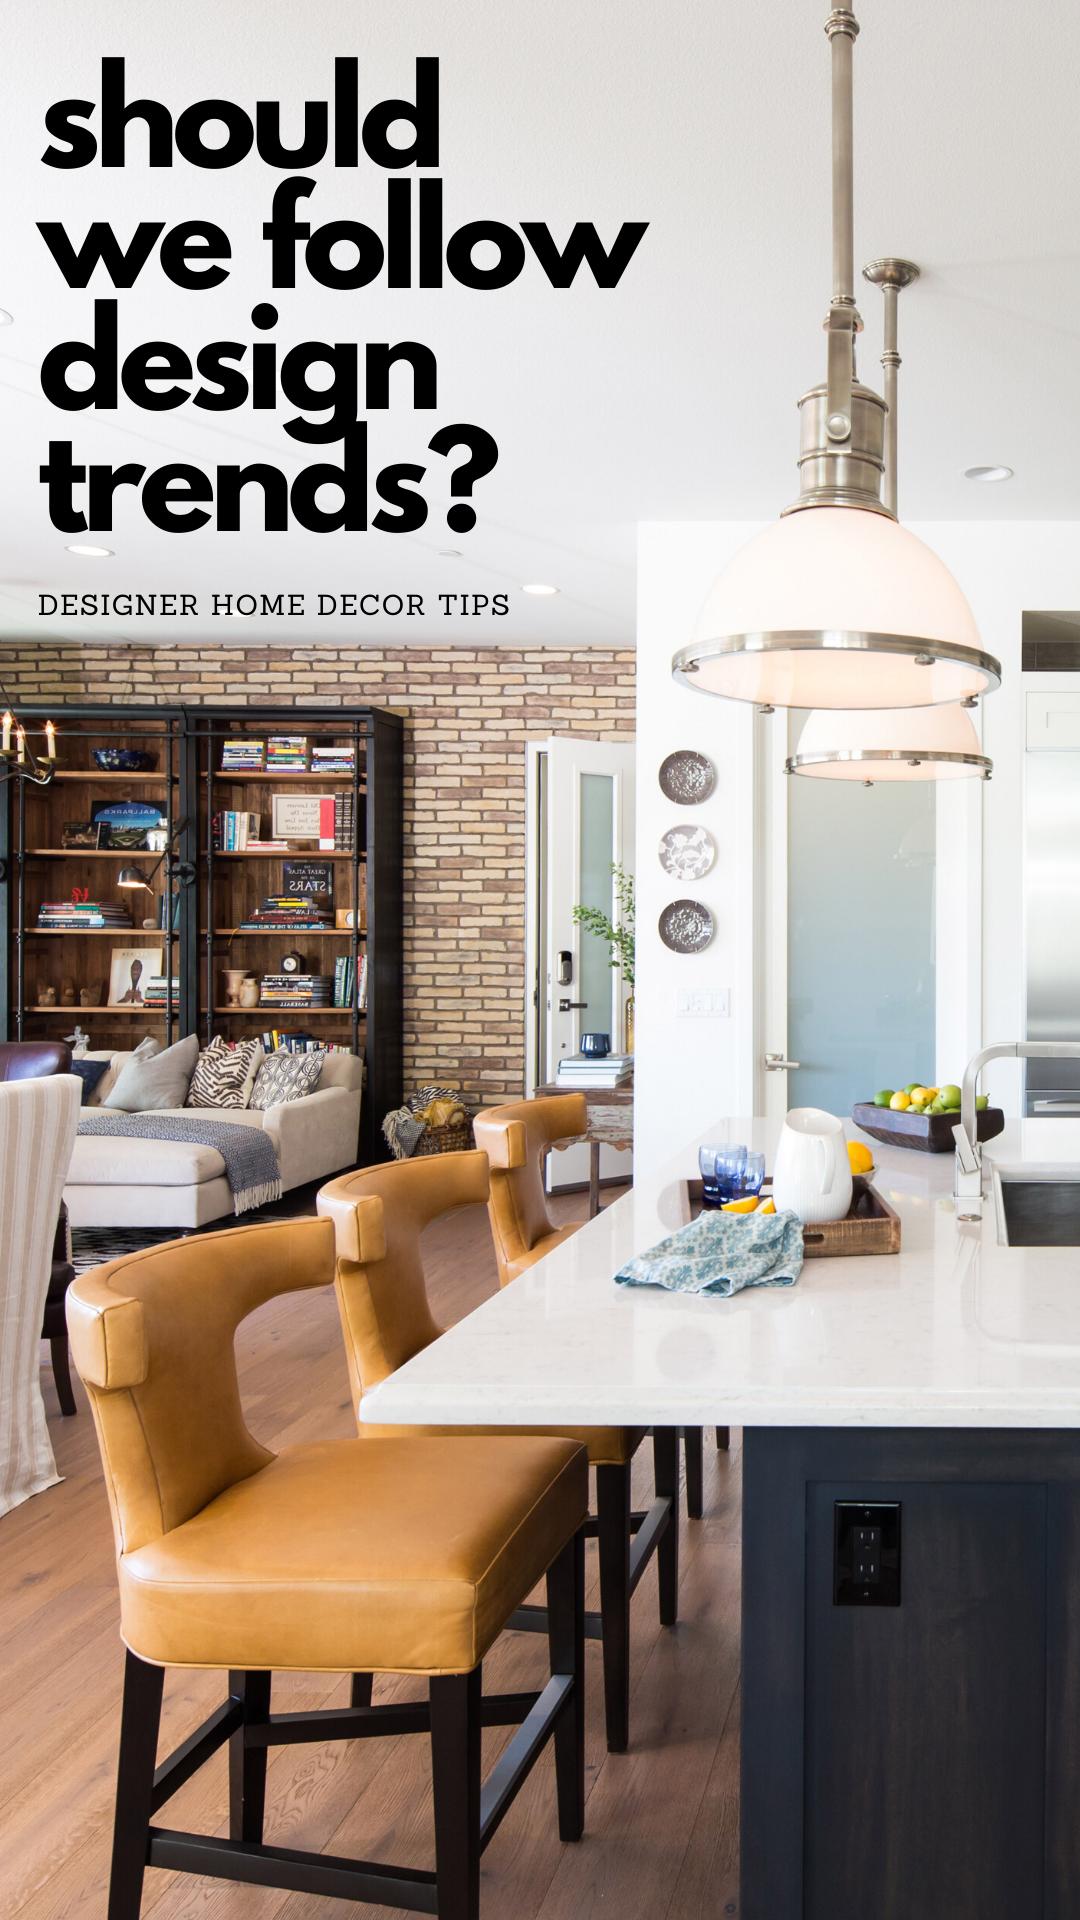 should we follow design trends?